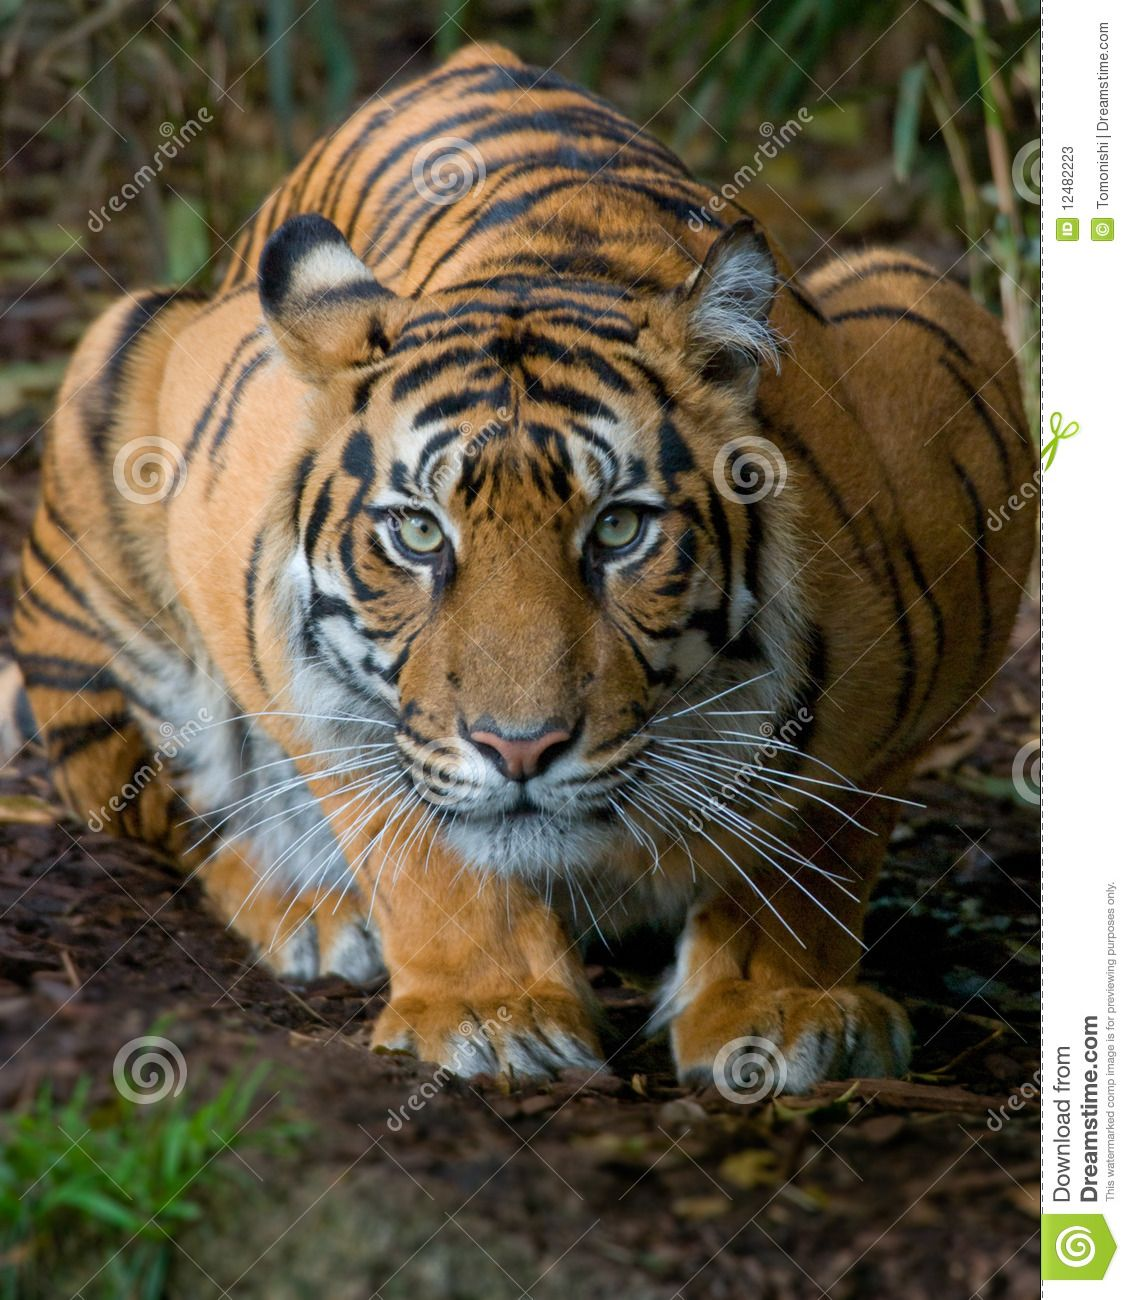 Tiger Crouching Google Search Crouching Tiger Pet Tiger Tiger